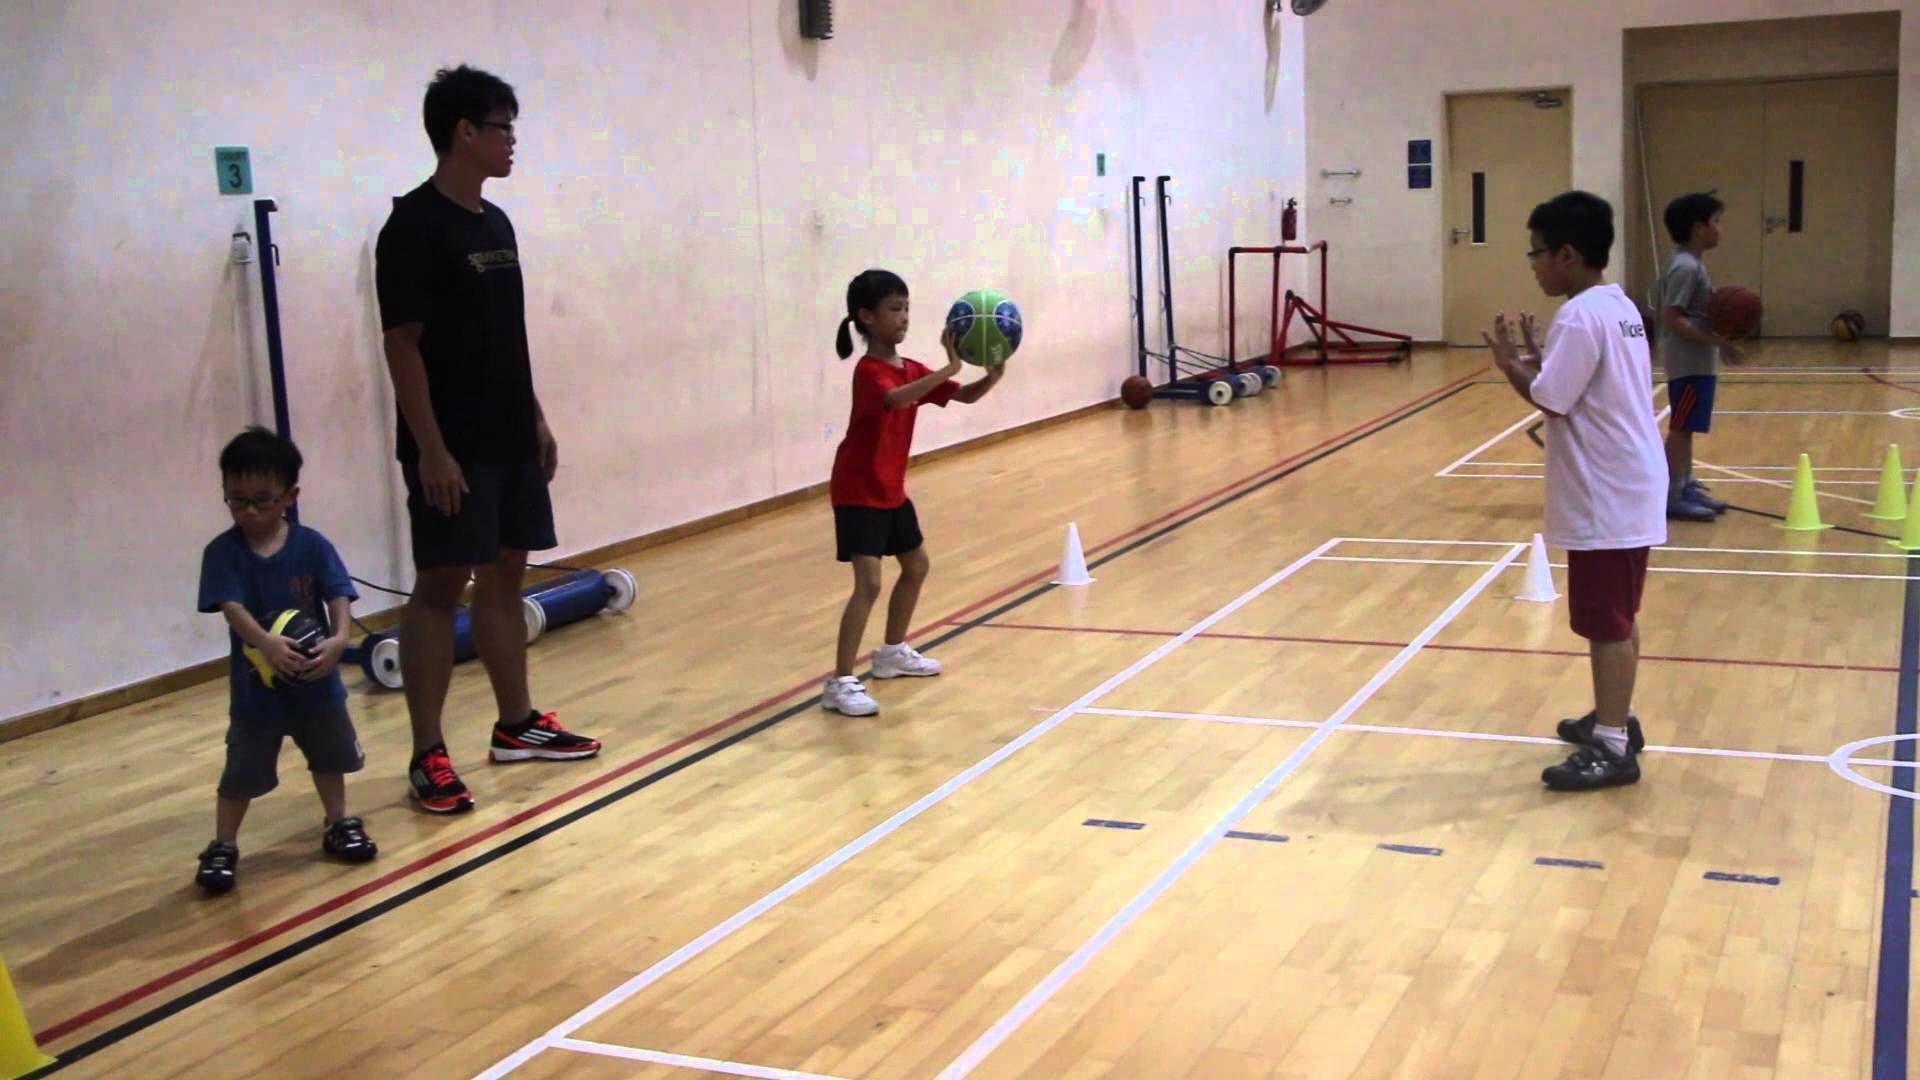 Basketball Training Lesson Singapore Basketball Startyoung Sgbasketball Singaporebasketball Sgb Basketball Training Basketball Academy Basketball